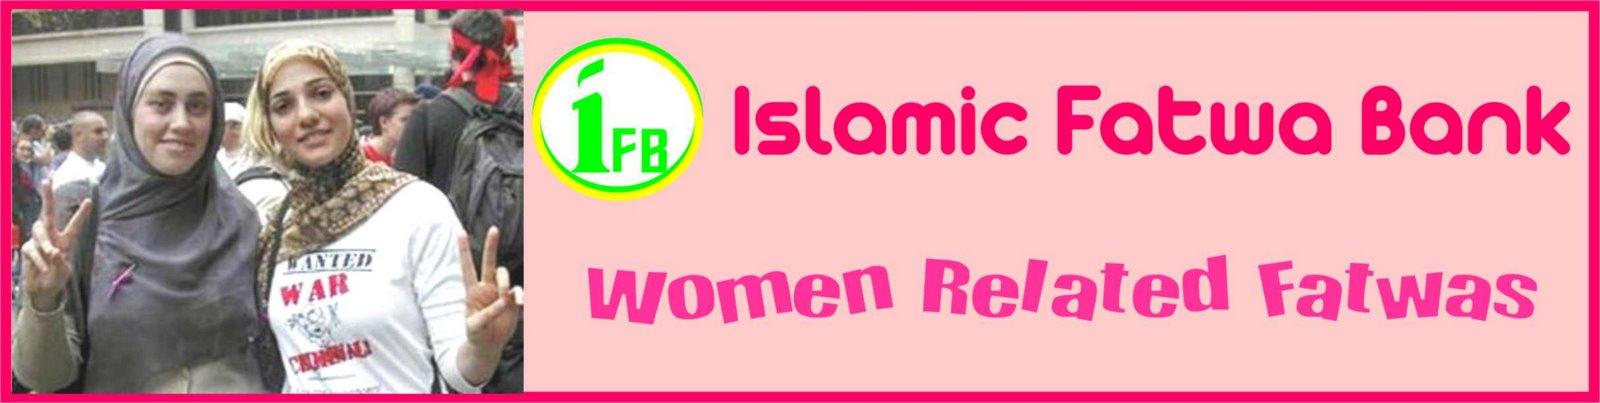 Islamic Fatwa Bank